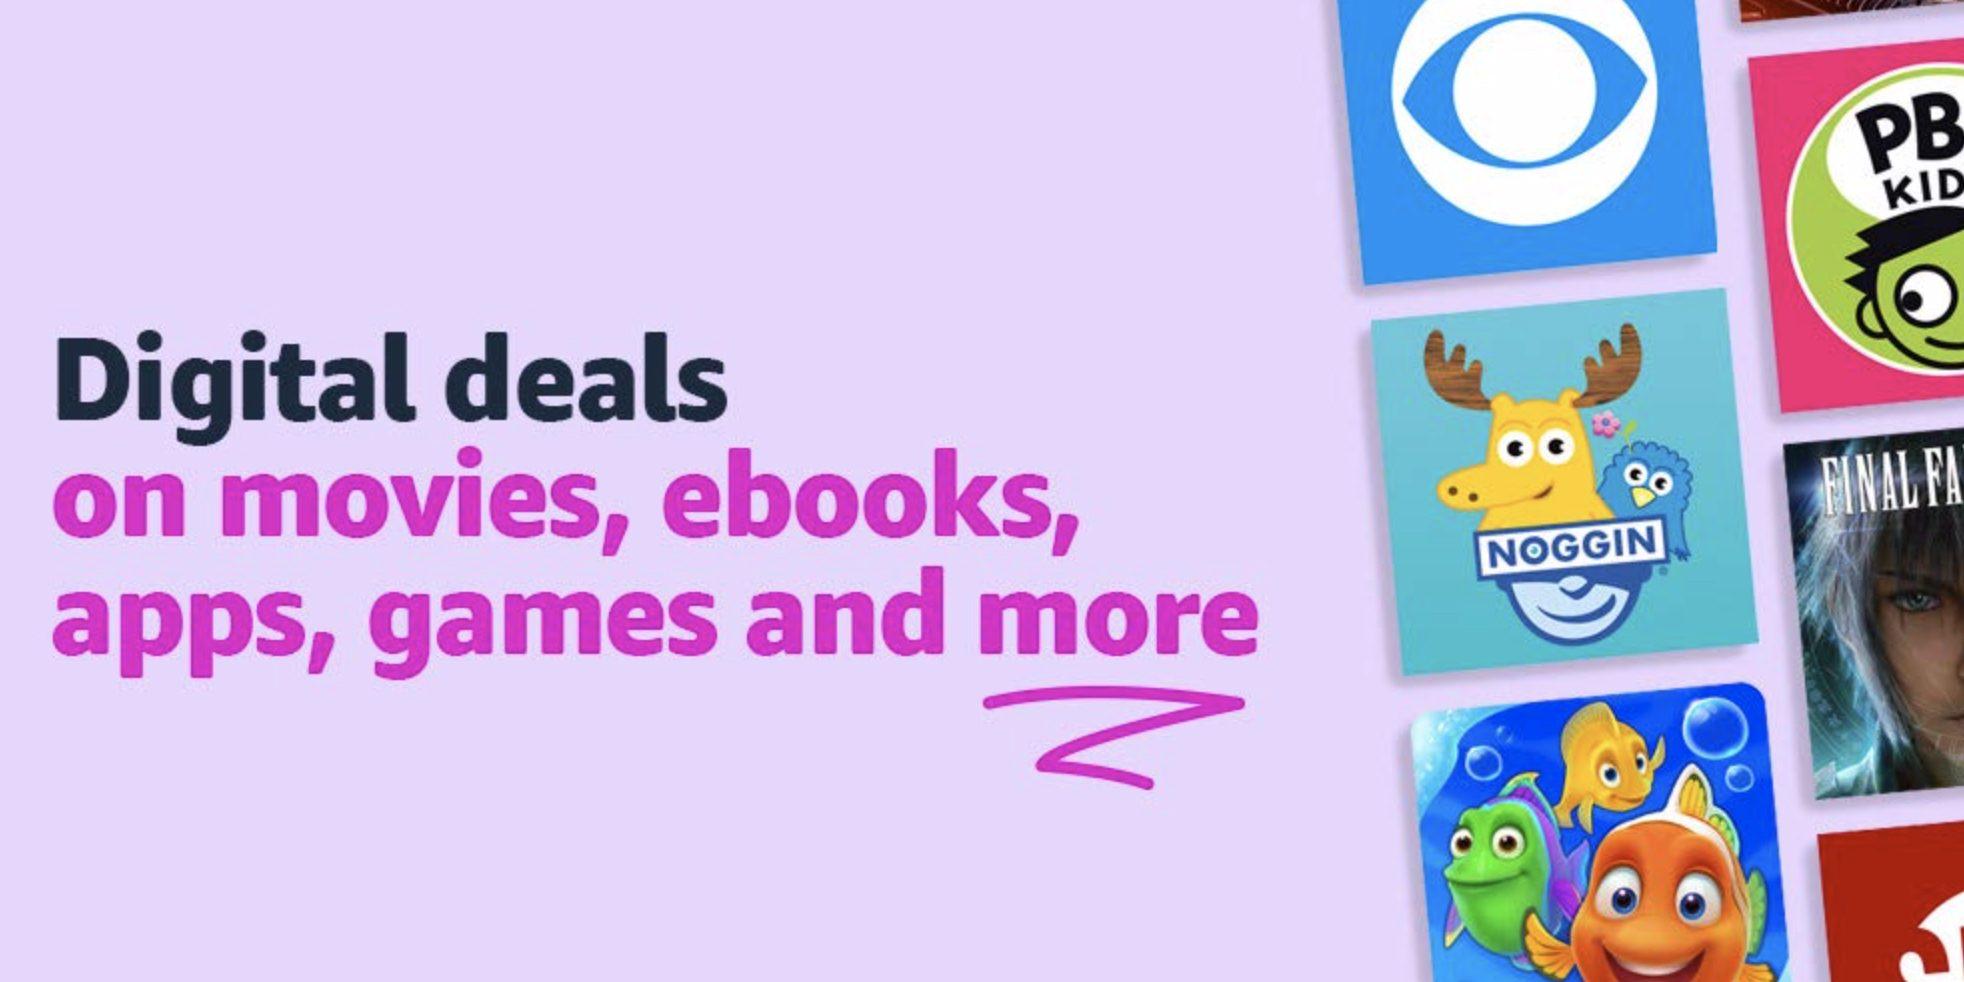 9to5Toys Mittagspause: Google Home Hub 2 Minis 129, Pixel-Knospen 109, Google Play-Geschenkkarte 15%, mehr